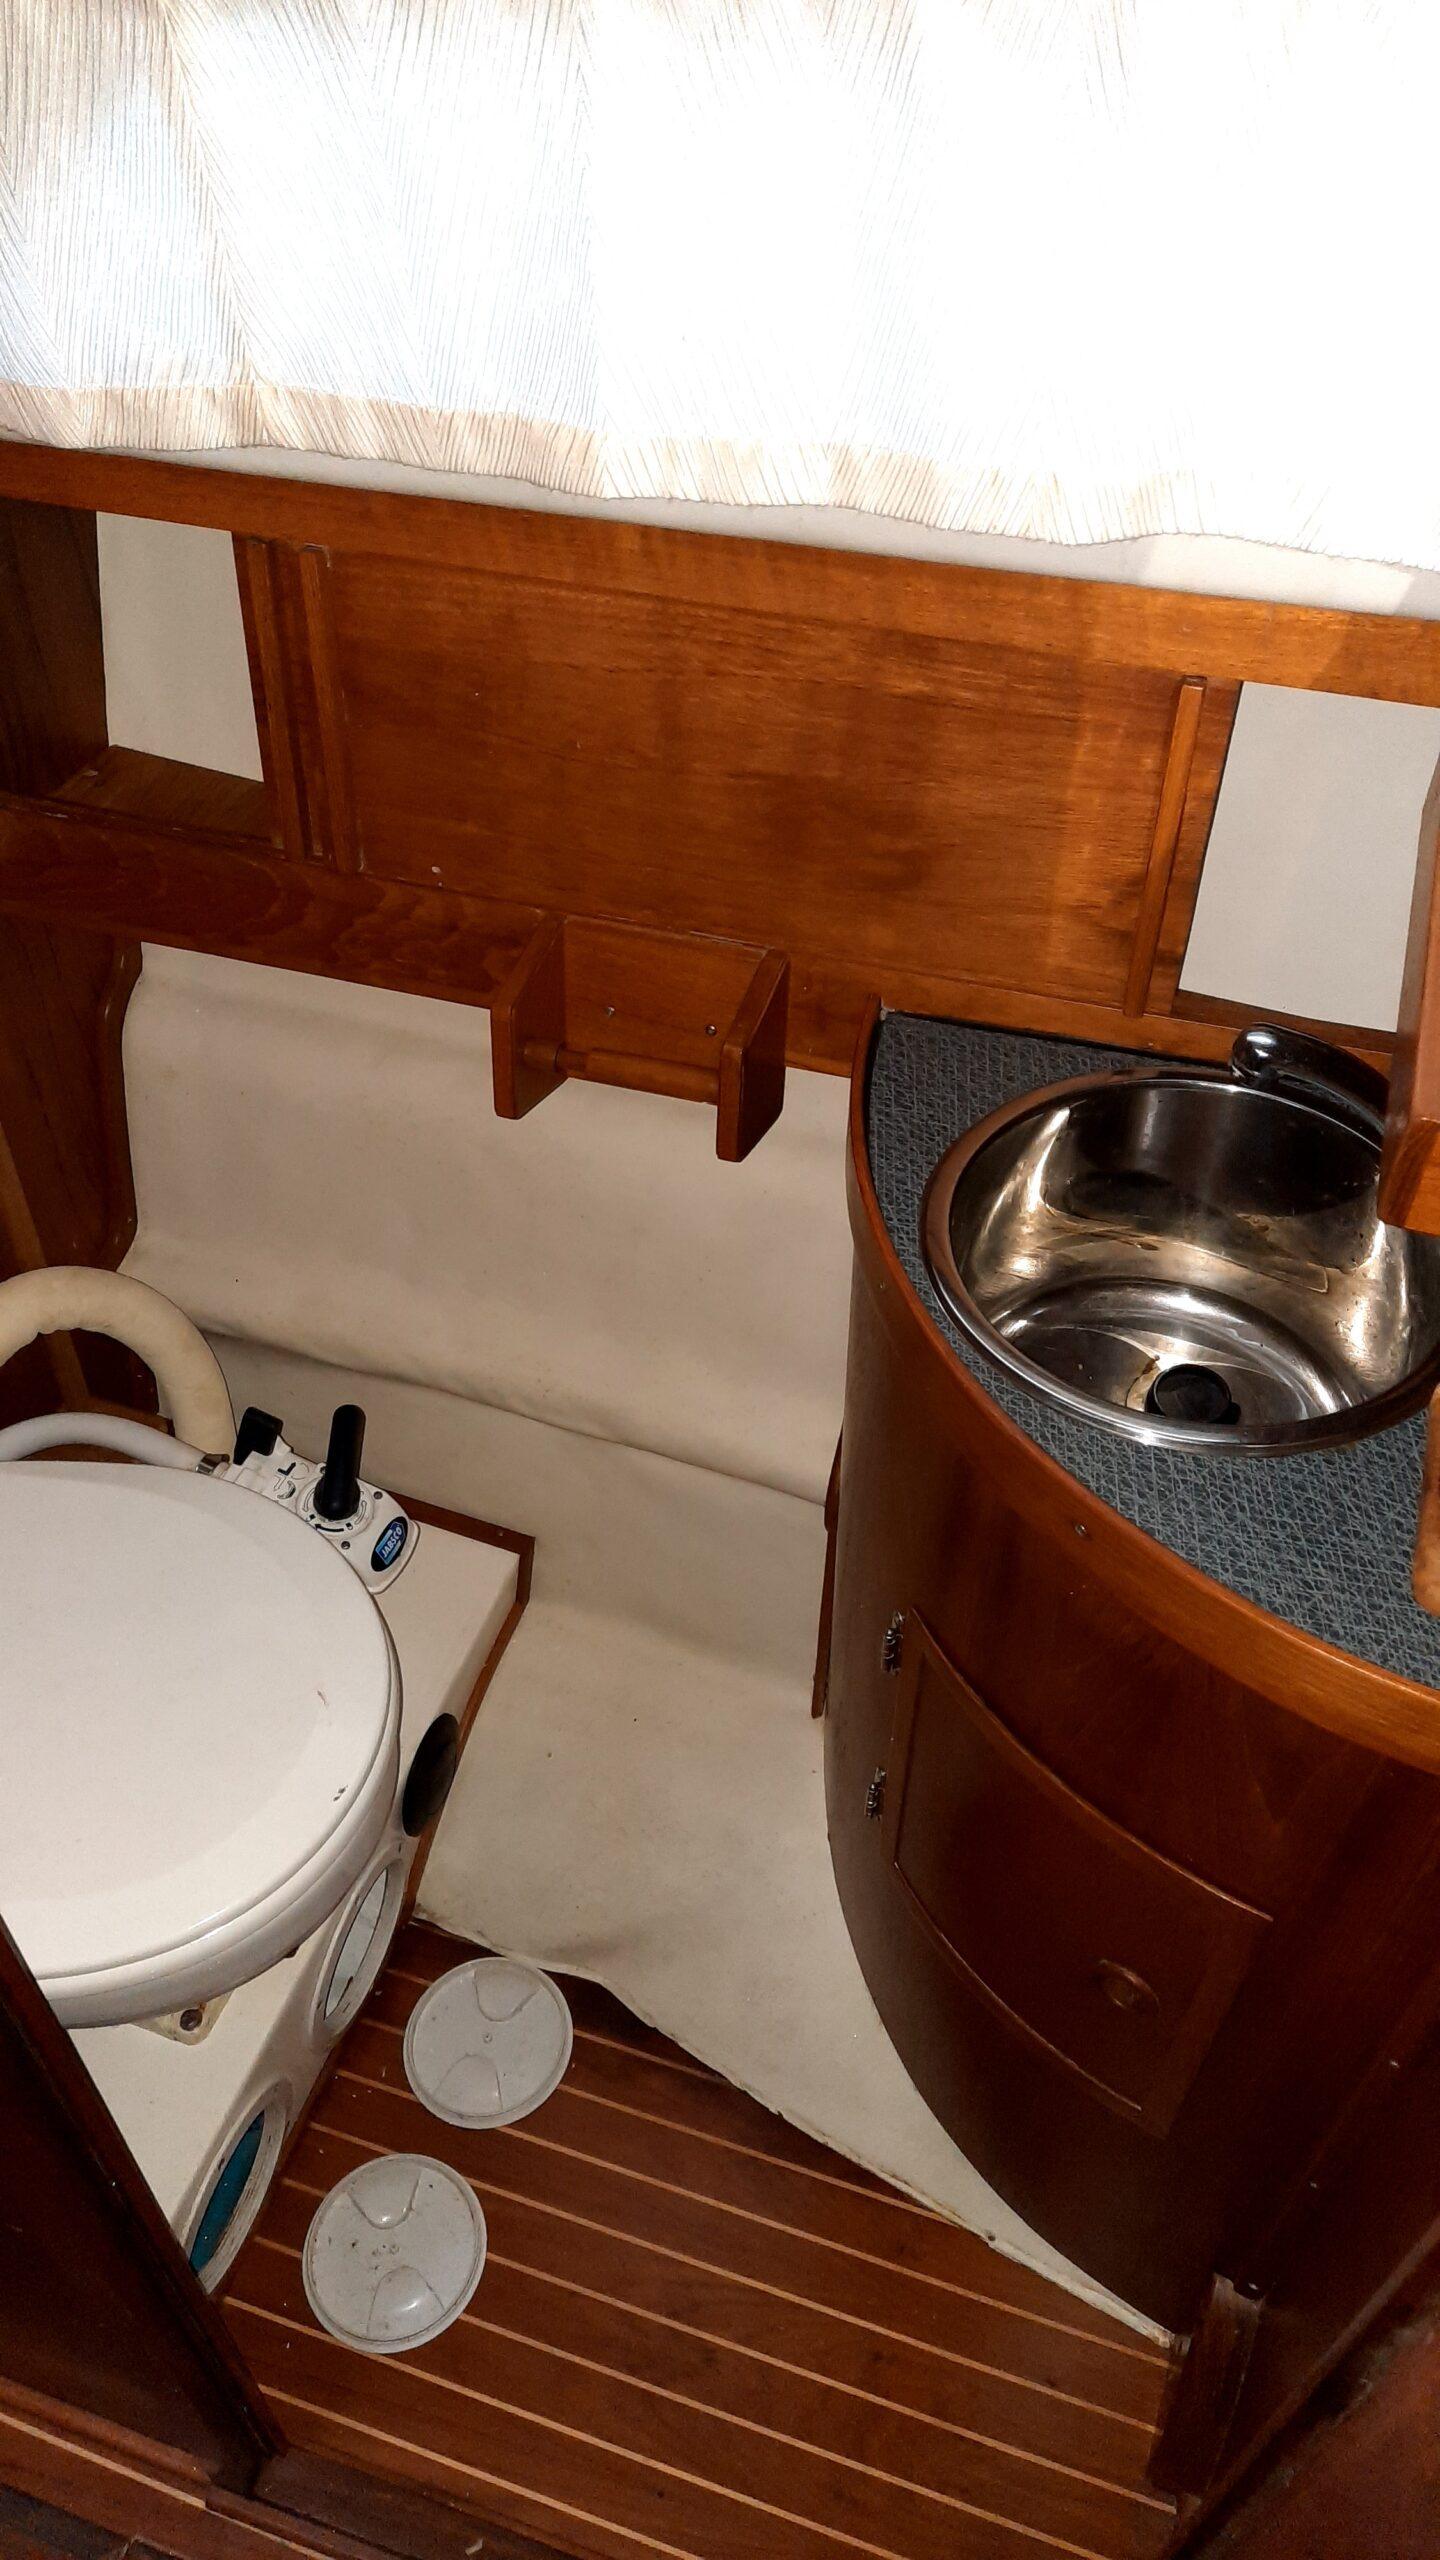 båt fjord toa